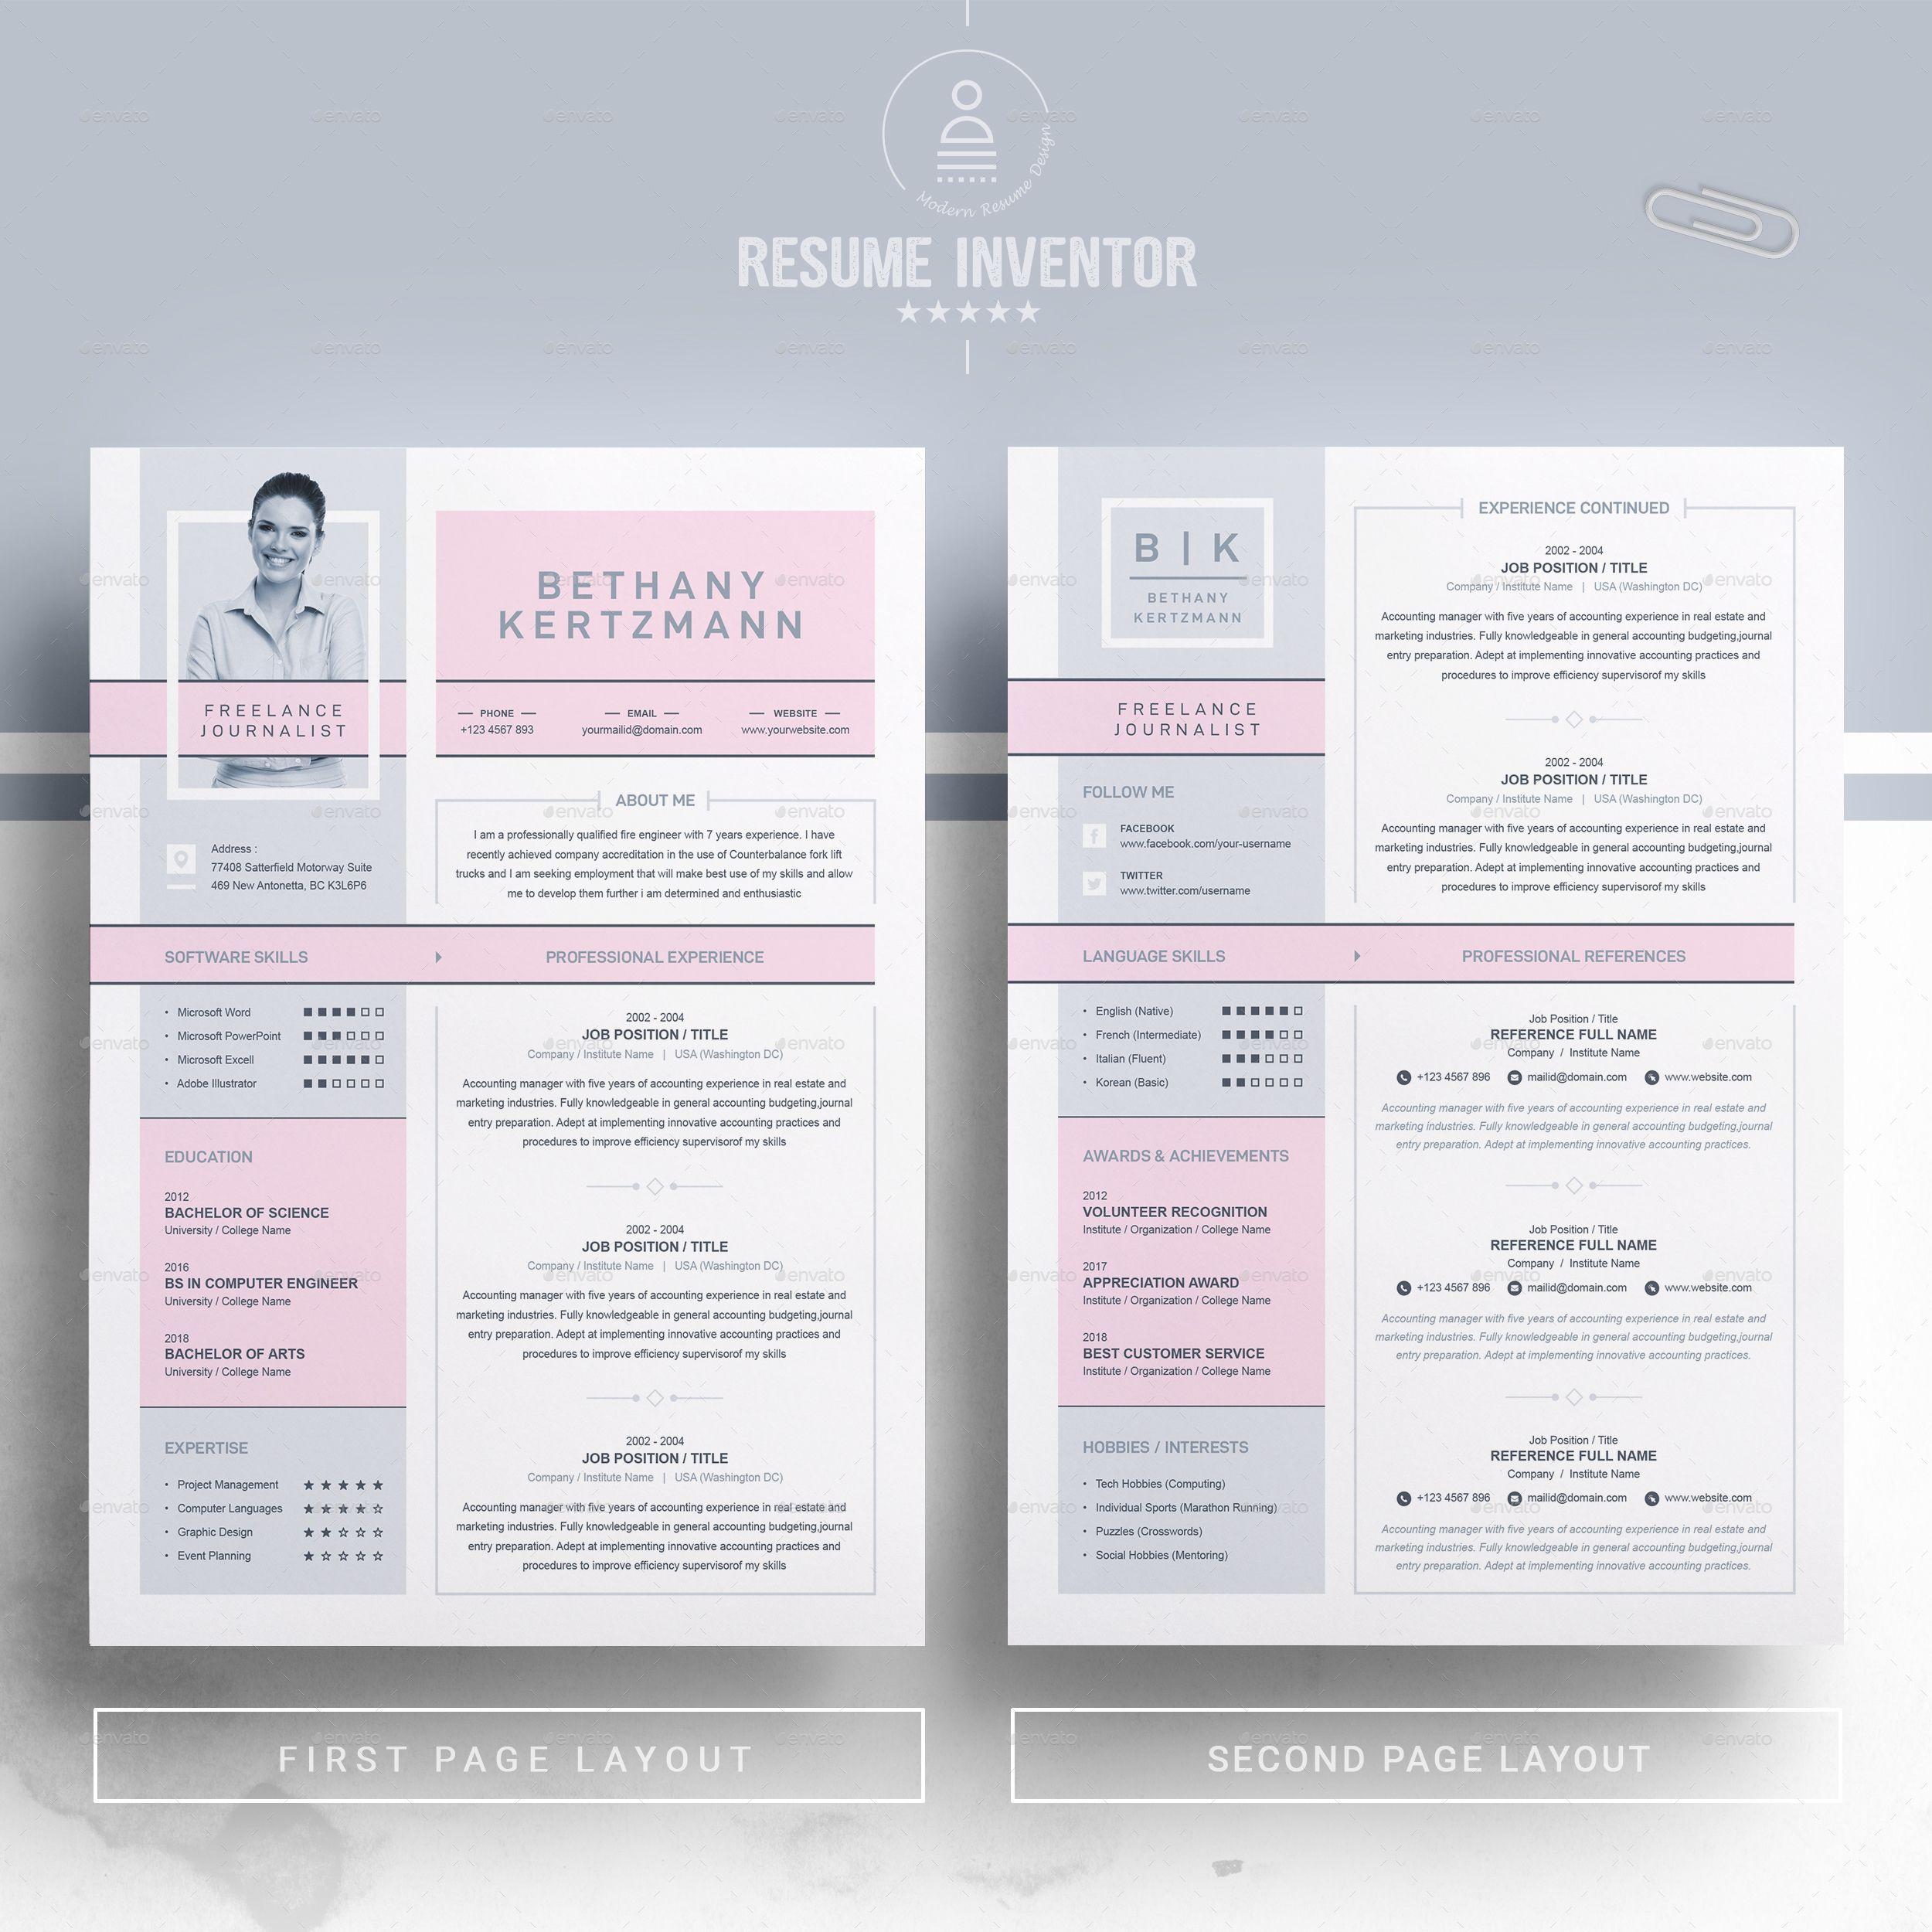 Creative Cv Resume Design For Freelance And Journalist Cv Design Template Curriculum Vitae Template Cv Design